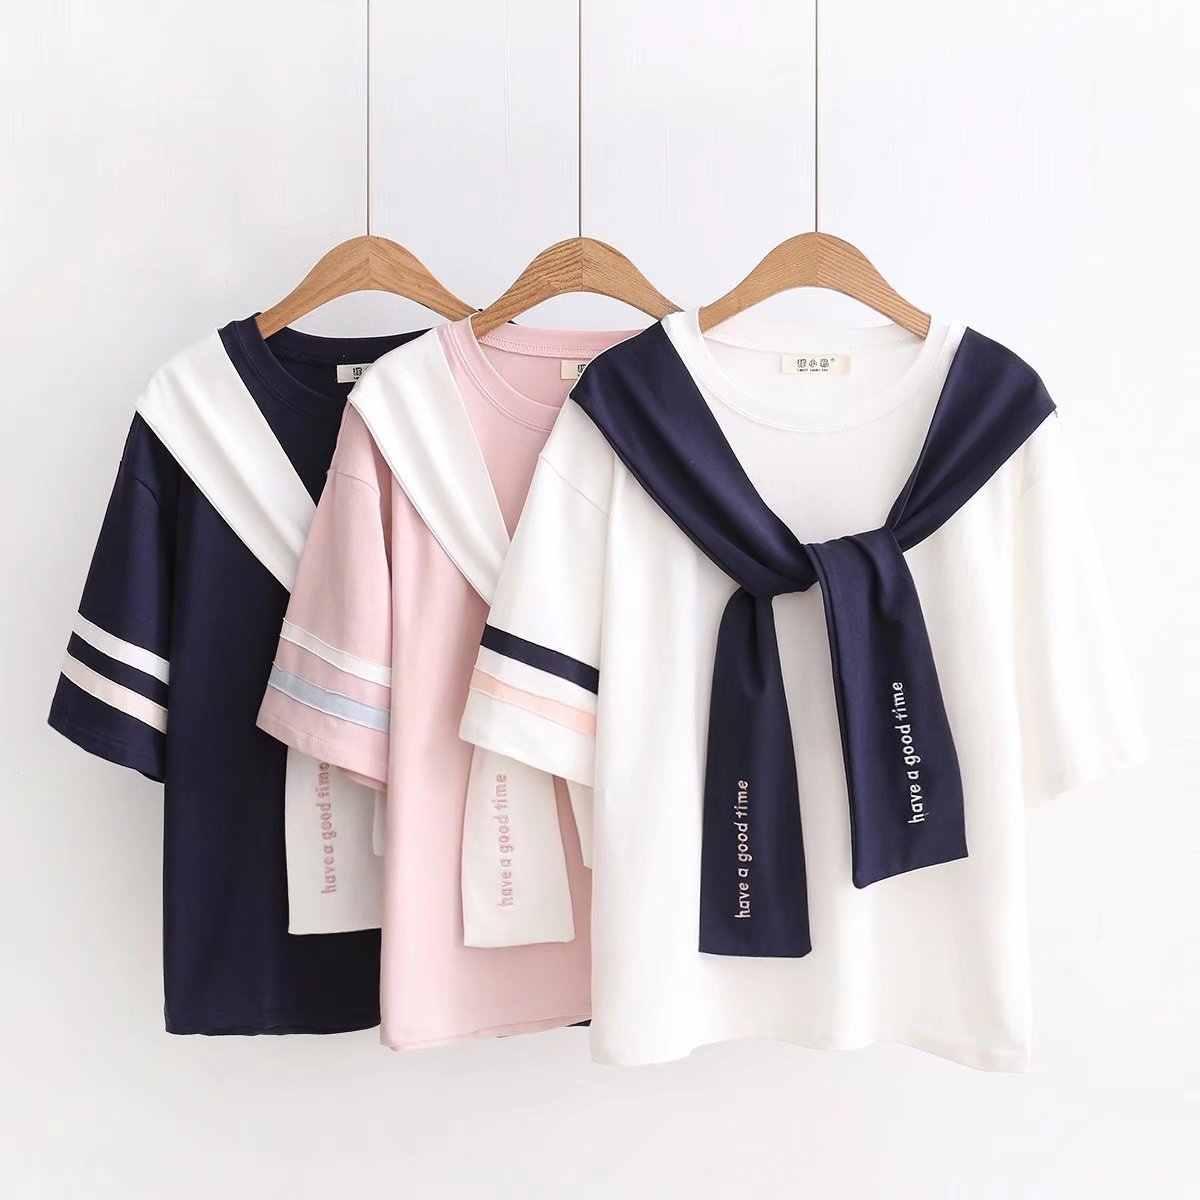 VEVEFHUANG 日本語パッチワークショール緩いセーラー tシャツ女性新夏の手紙刺繍 Tシャツ半袖トップスファム Tシャツ